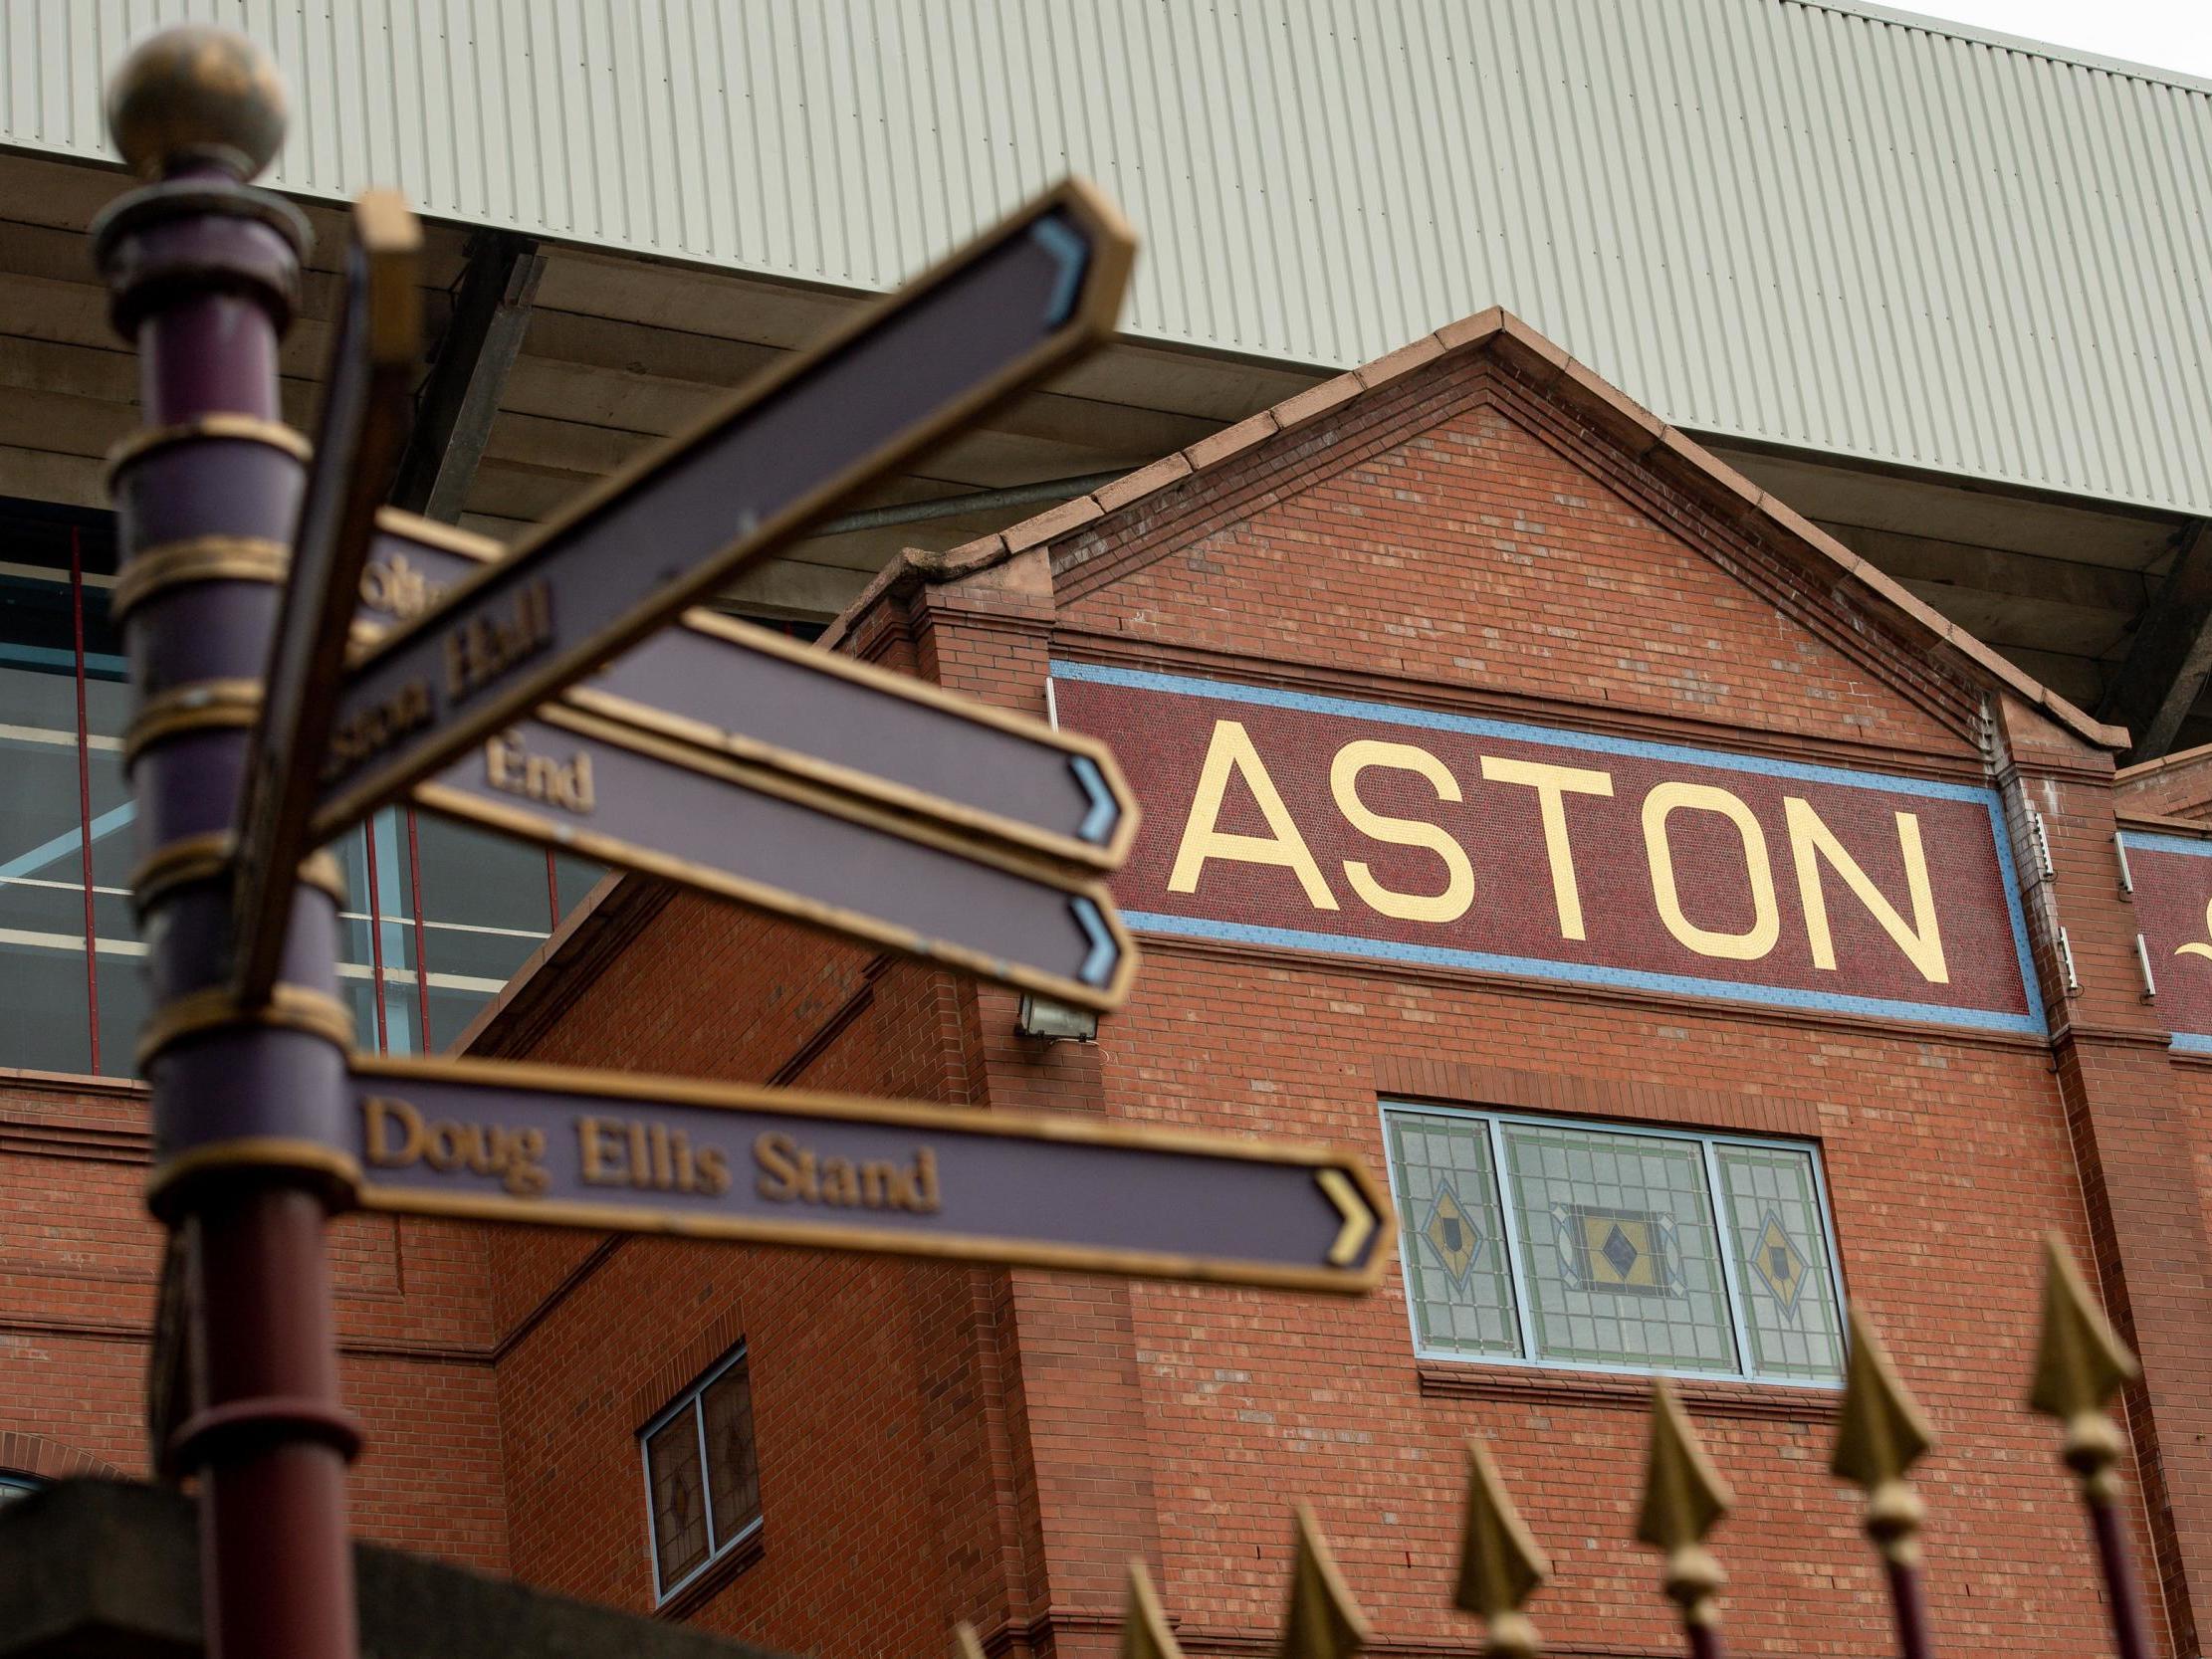 Aston Villa vs Sheffield United LIVE: Team news, line-ups and more ahead of Premier League fixture tonight thumbnail